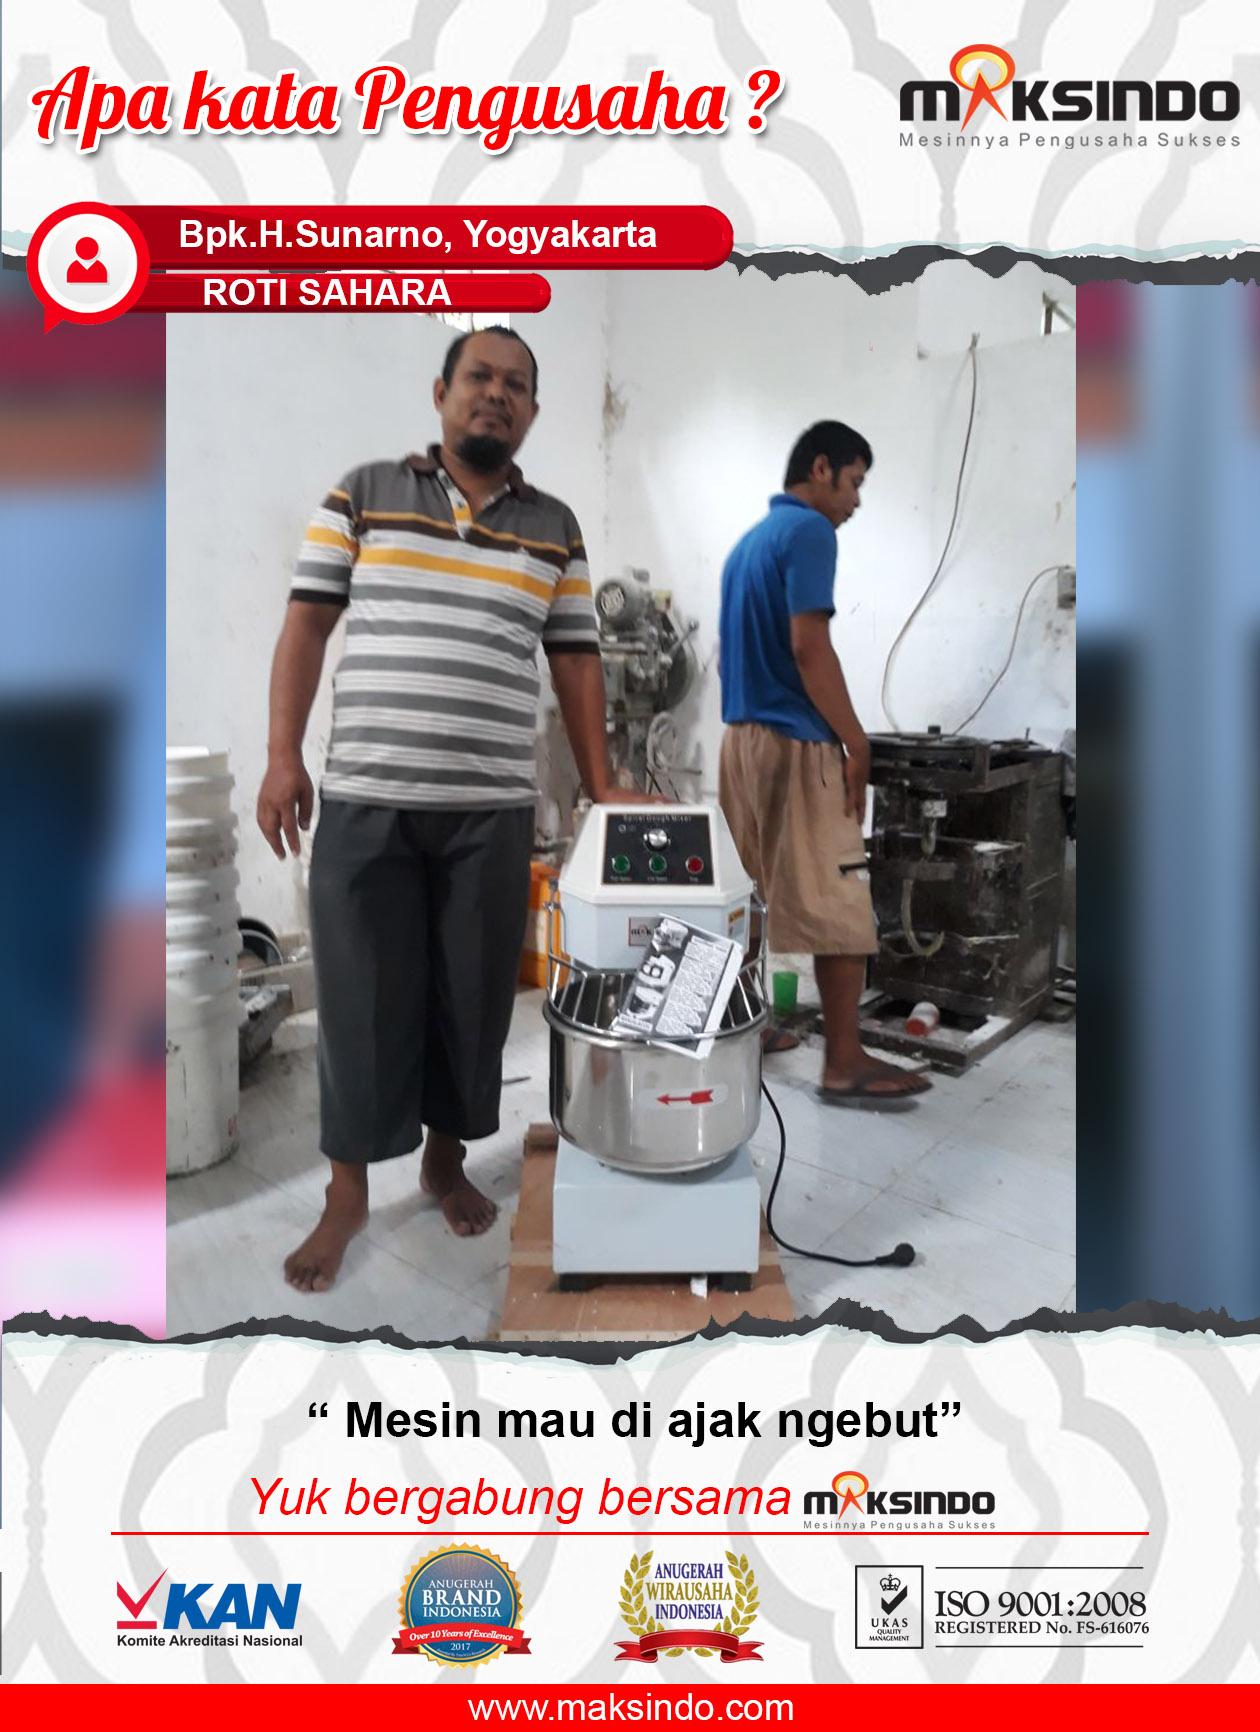 Roti Sahara : Mesin Mixer Spiral Maksindo Bisa Diajak Ngebut